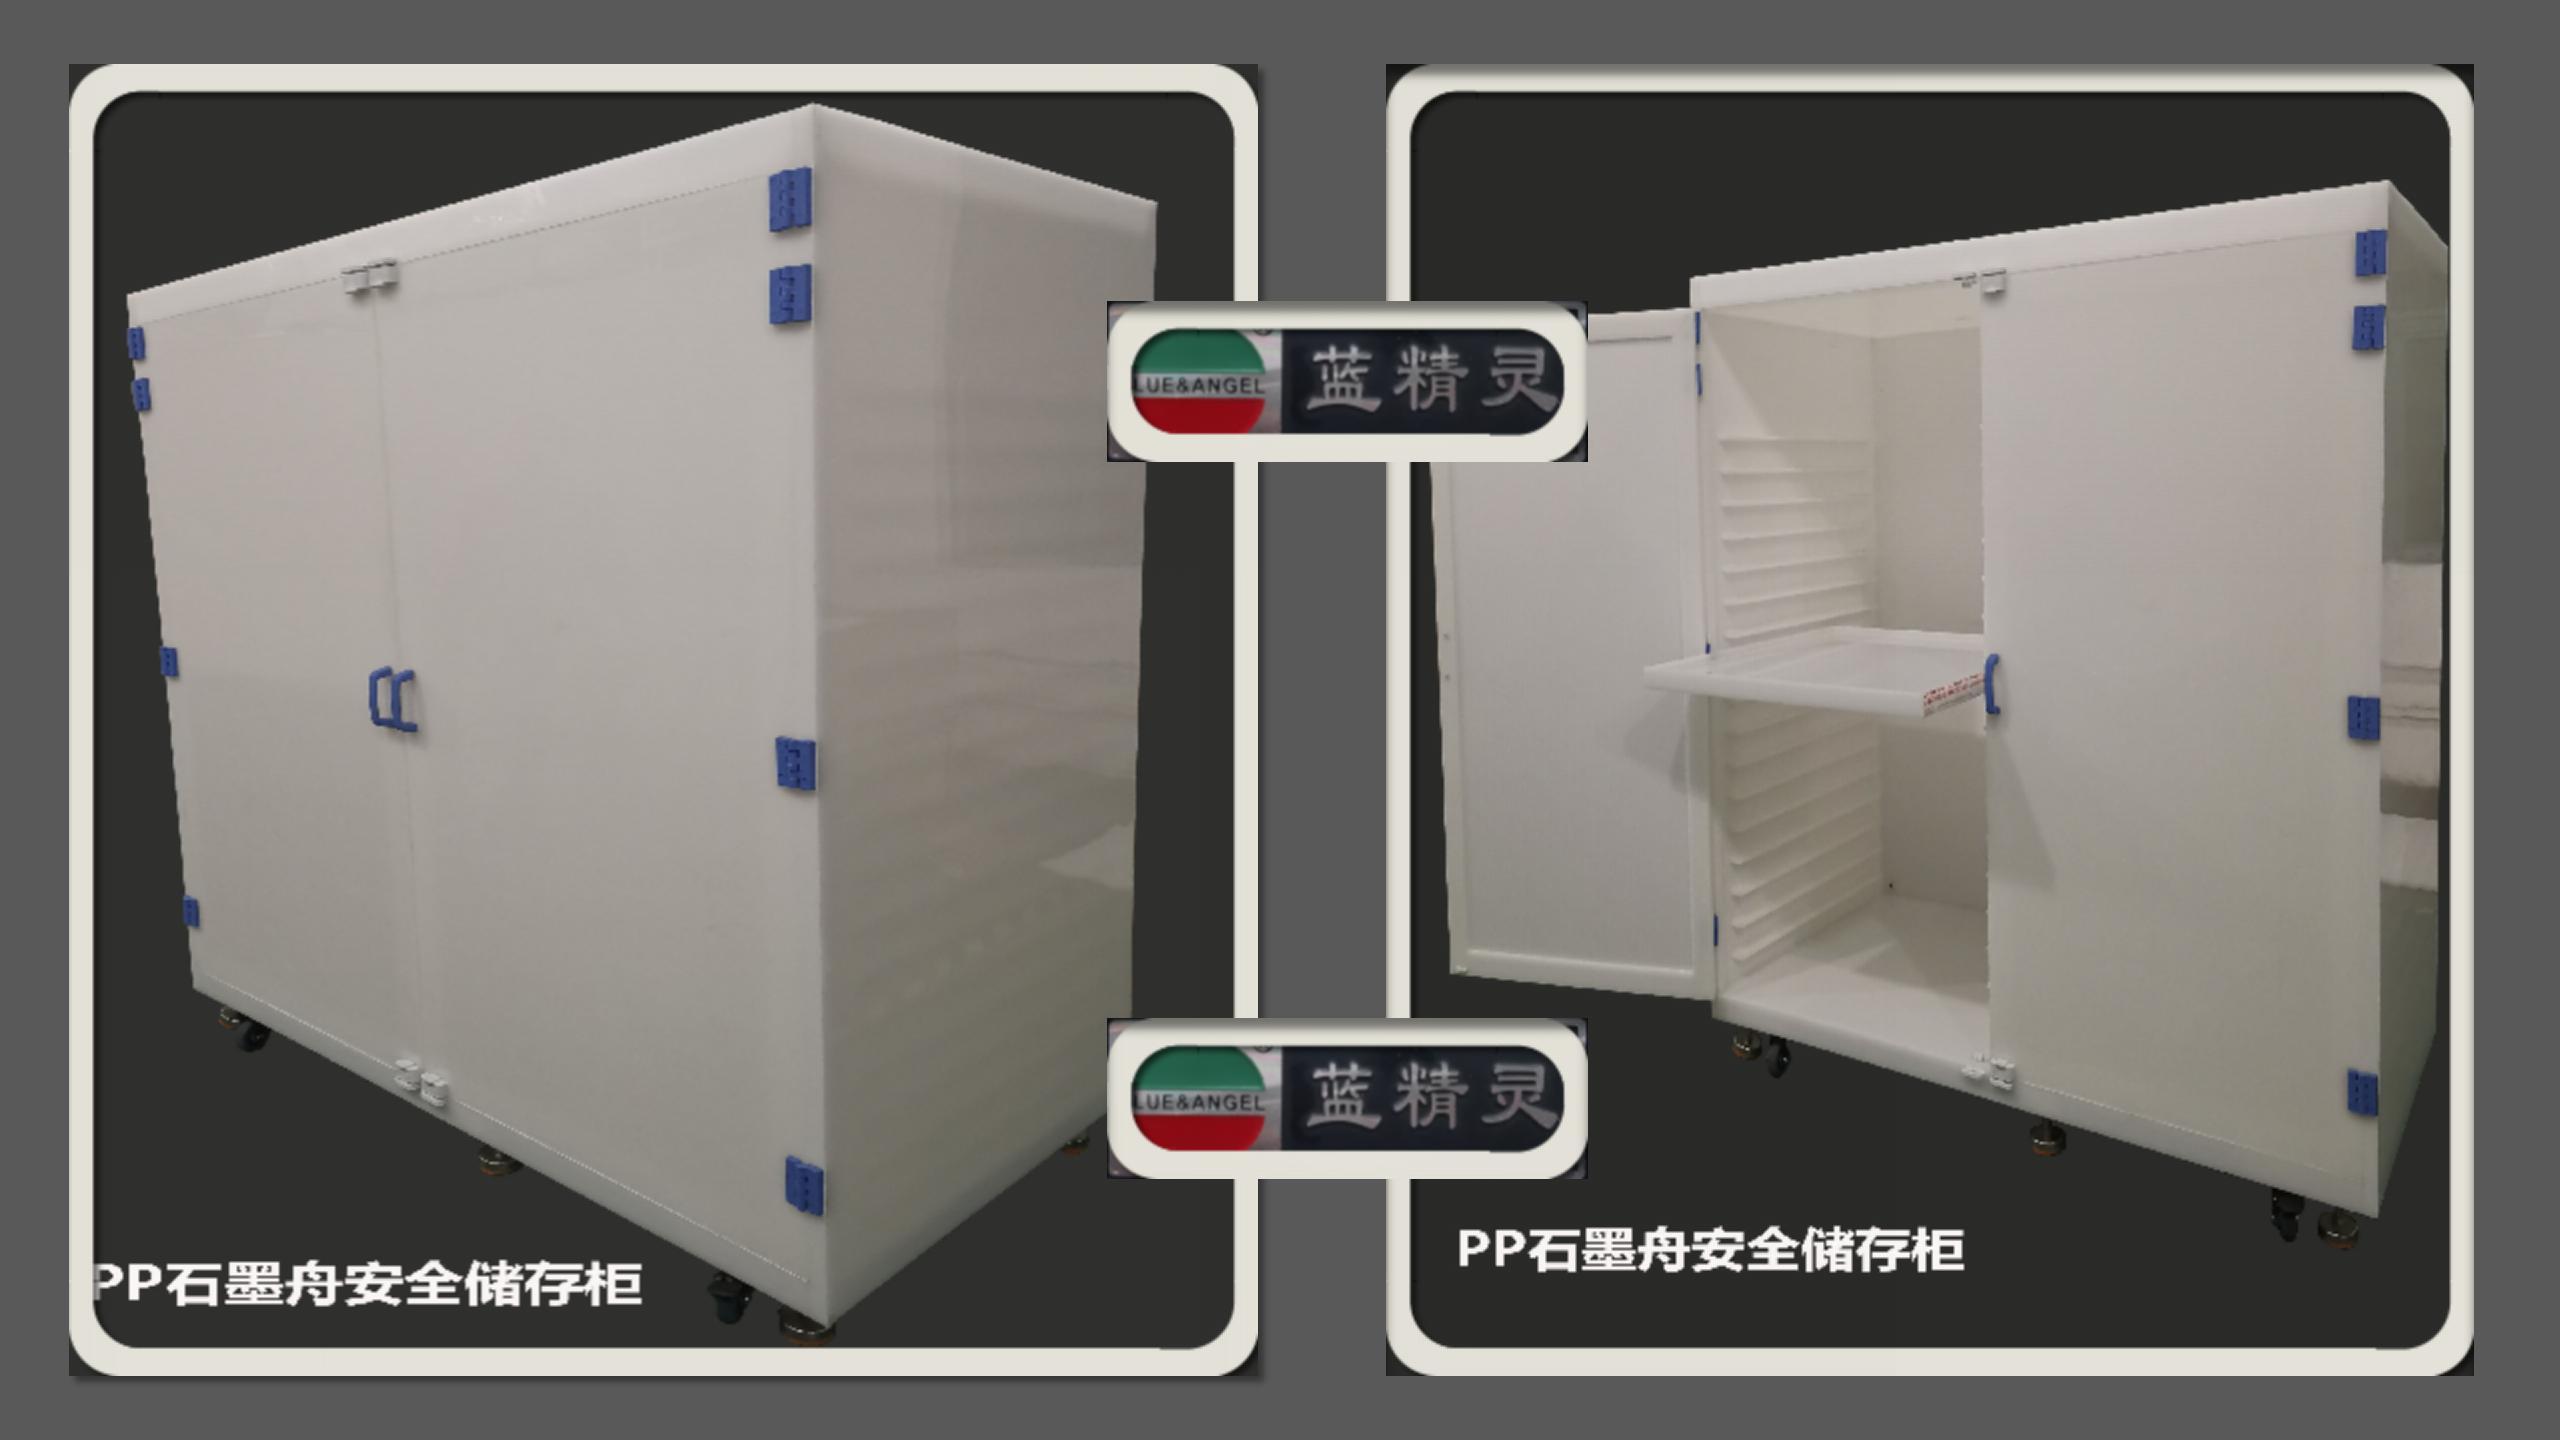 PP存儲柜